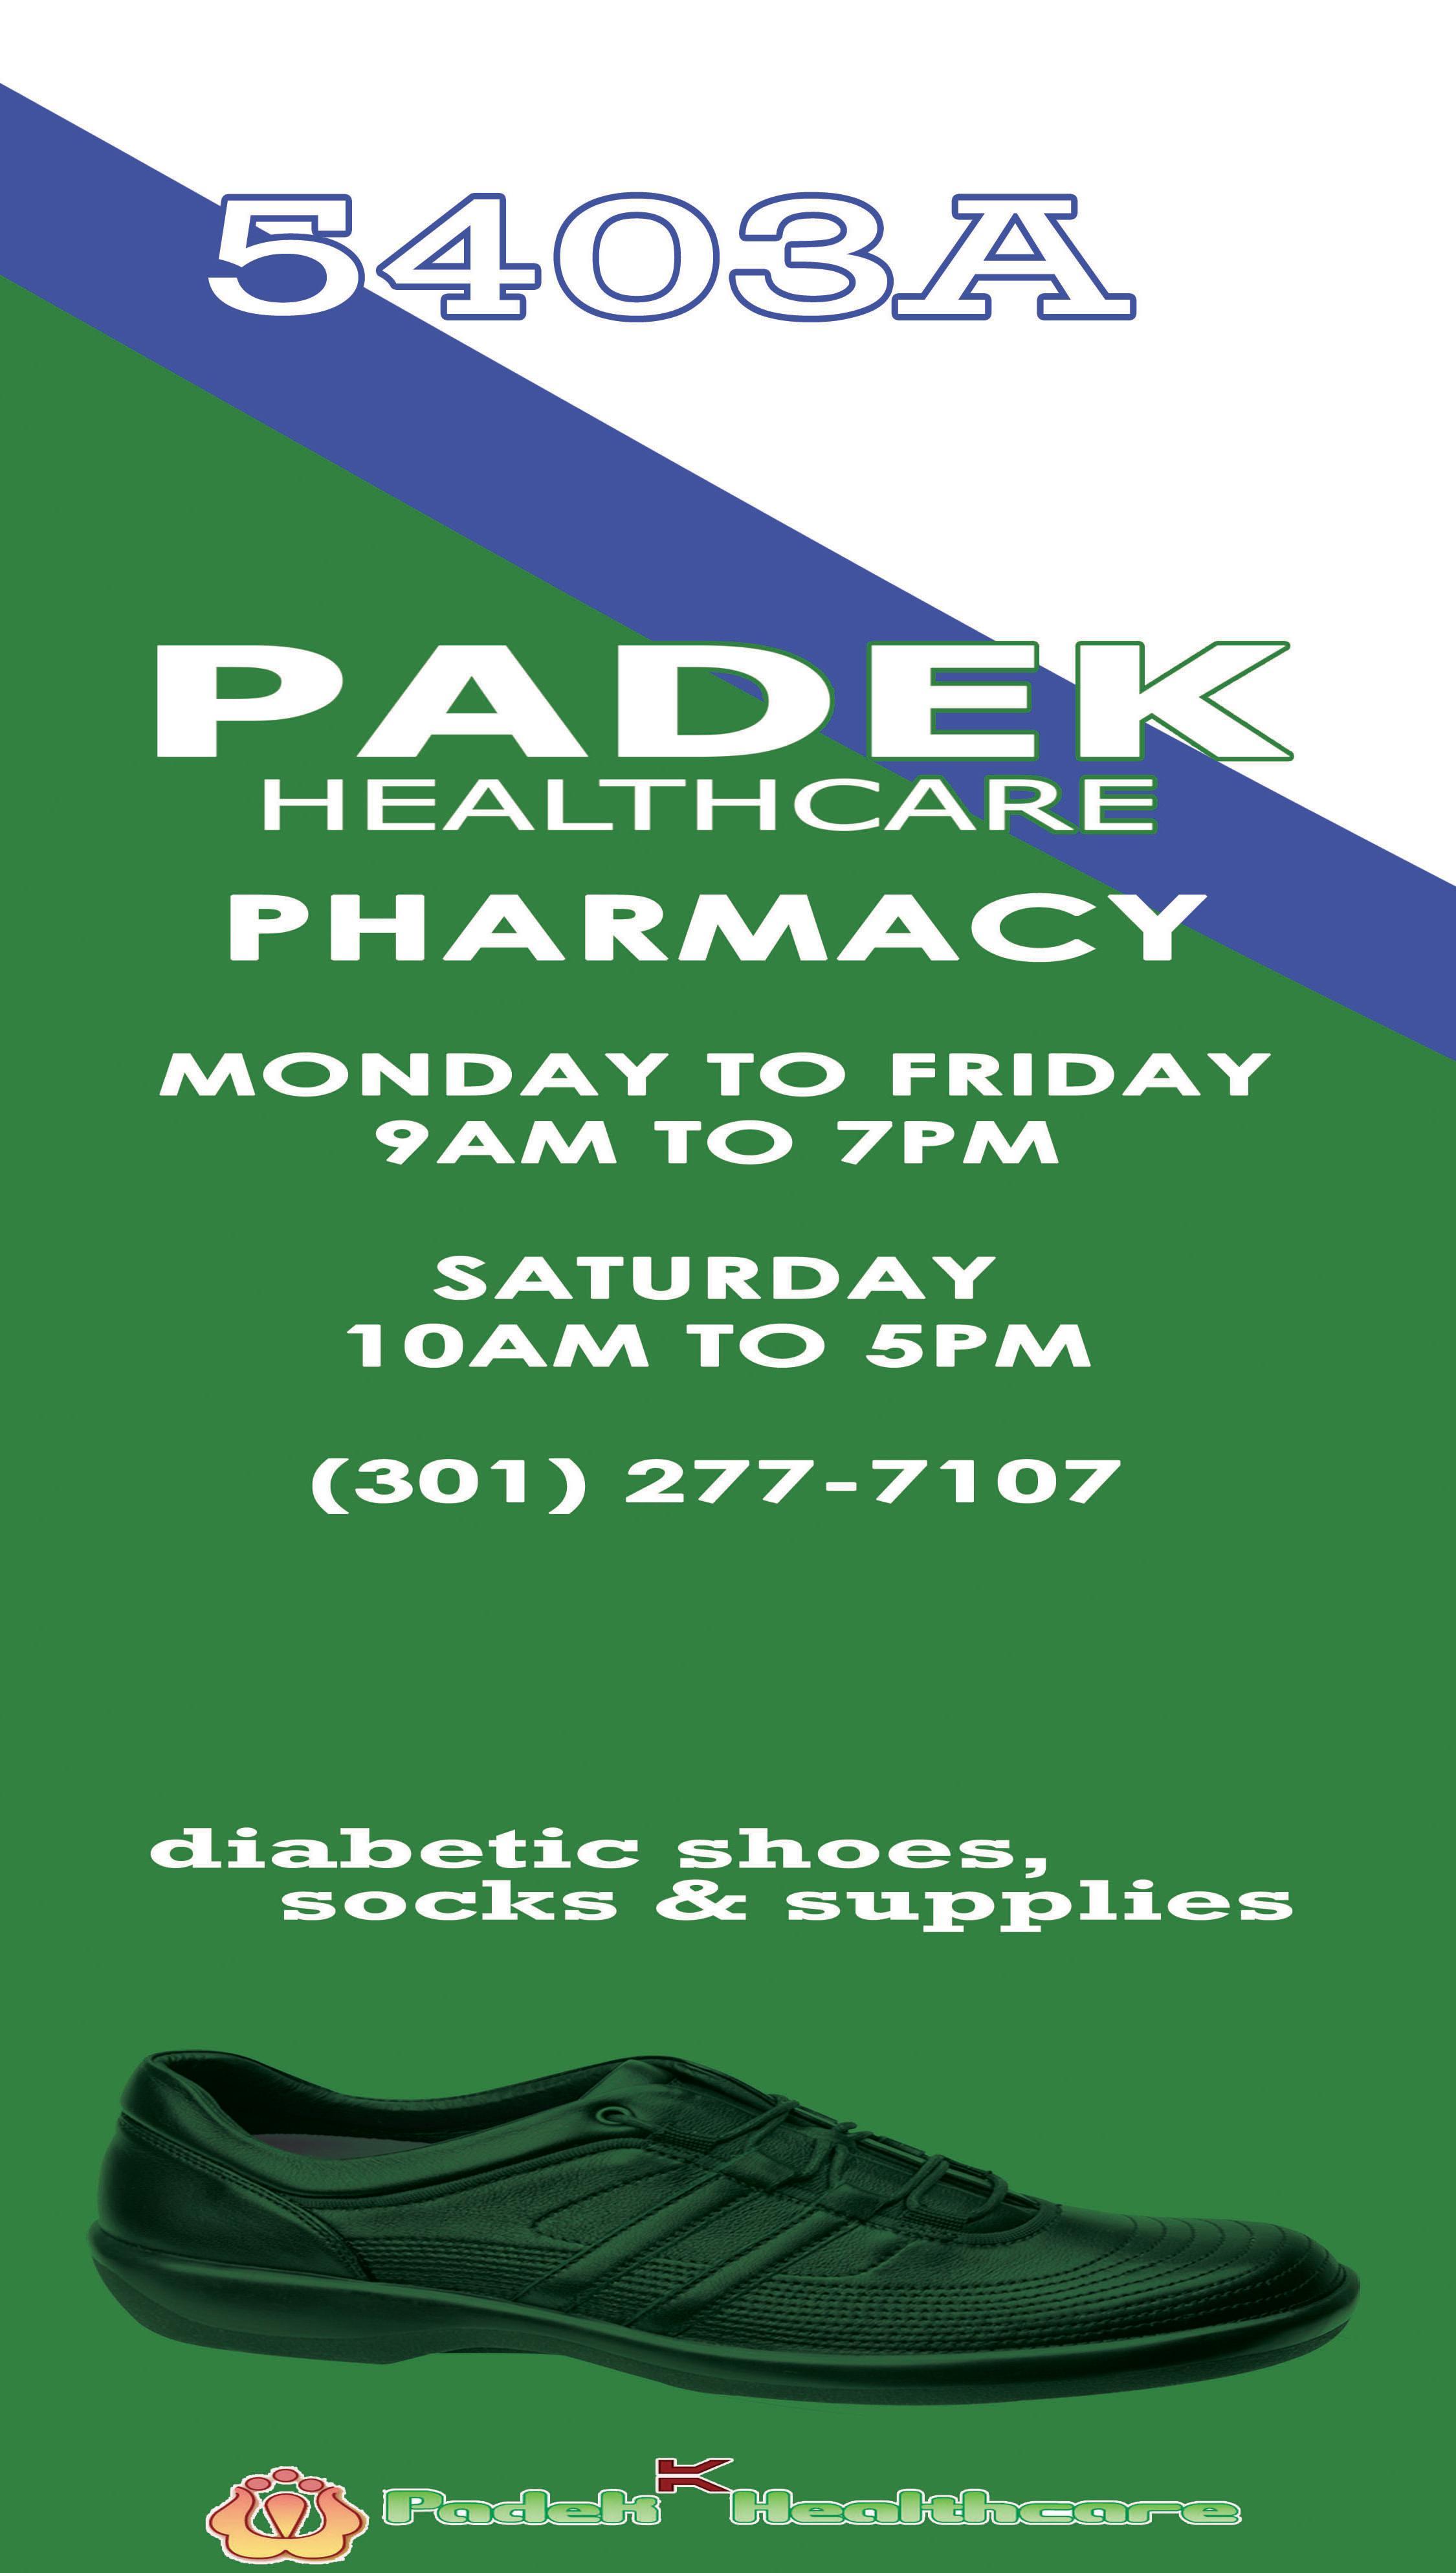 PADEK HEALTHCARE PHARMACY image 1